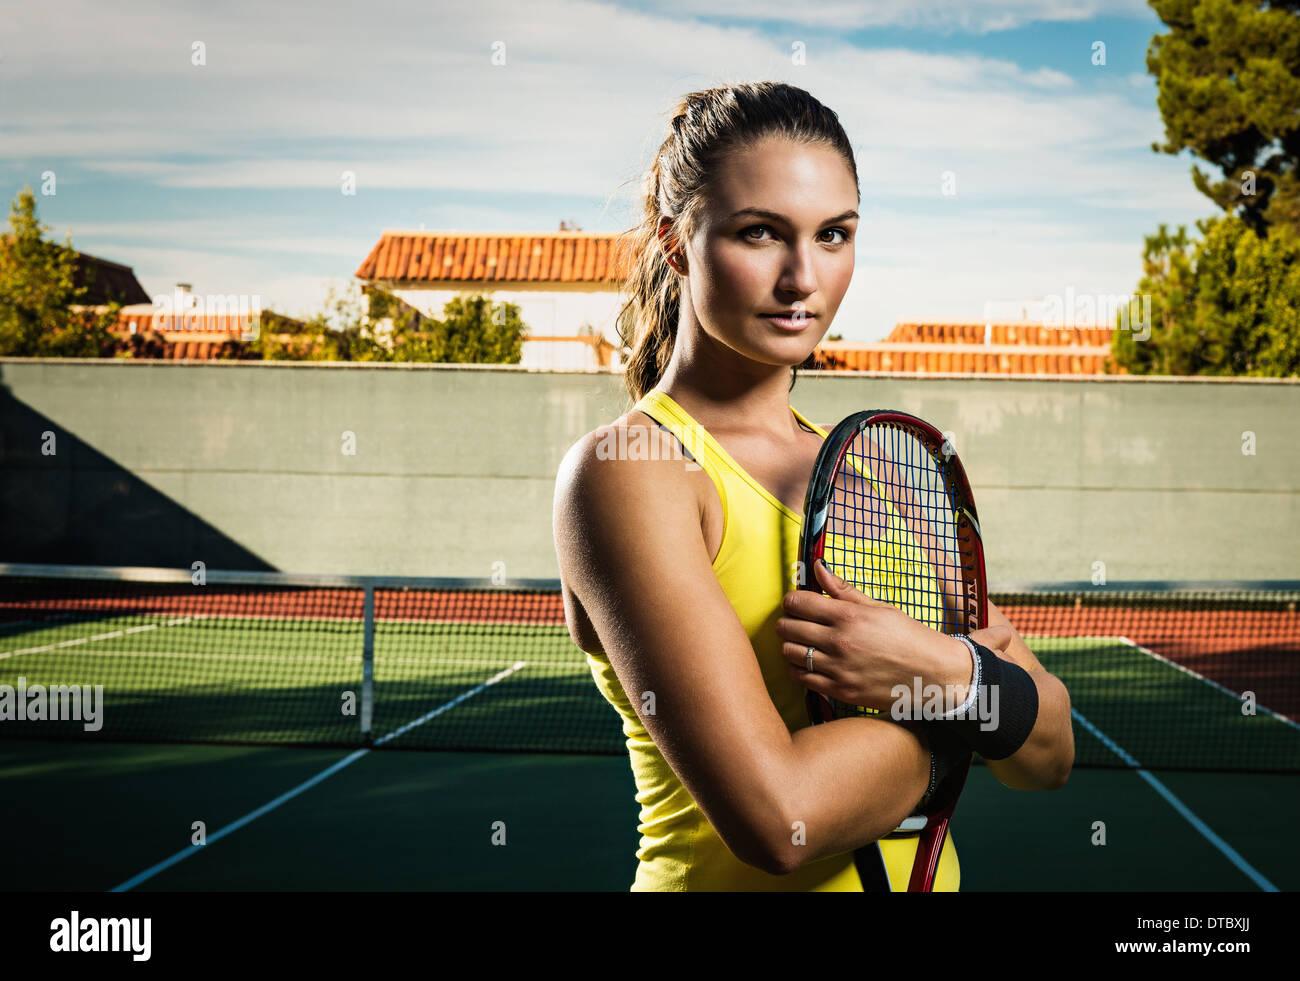 Female tennis player holding racket - Stock Image